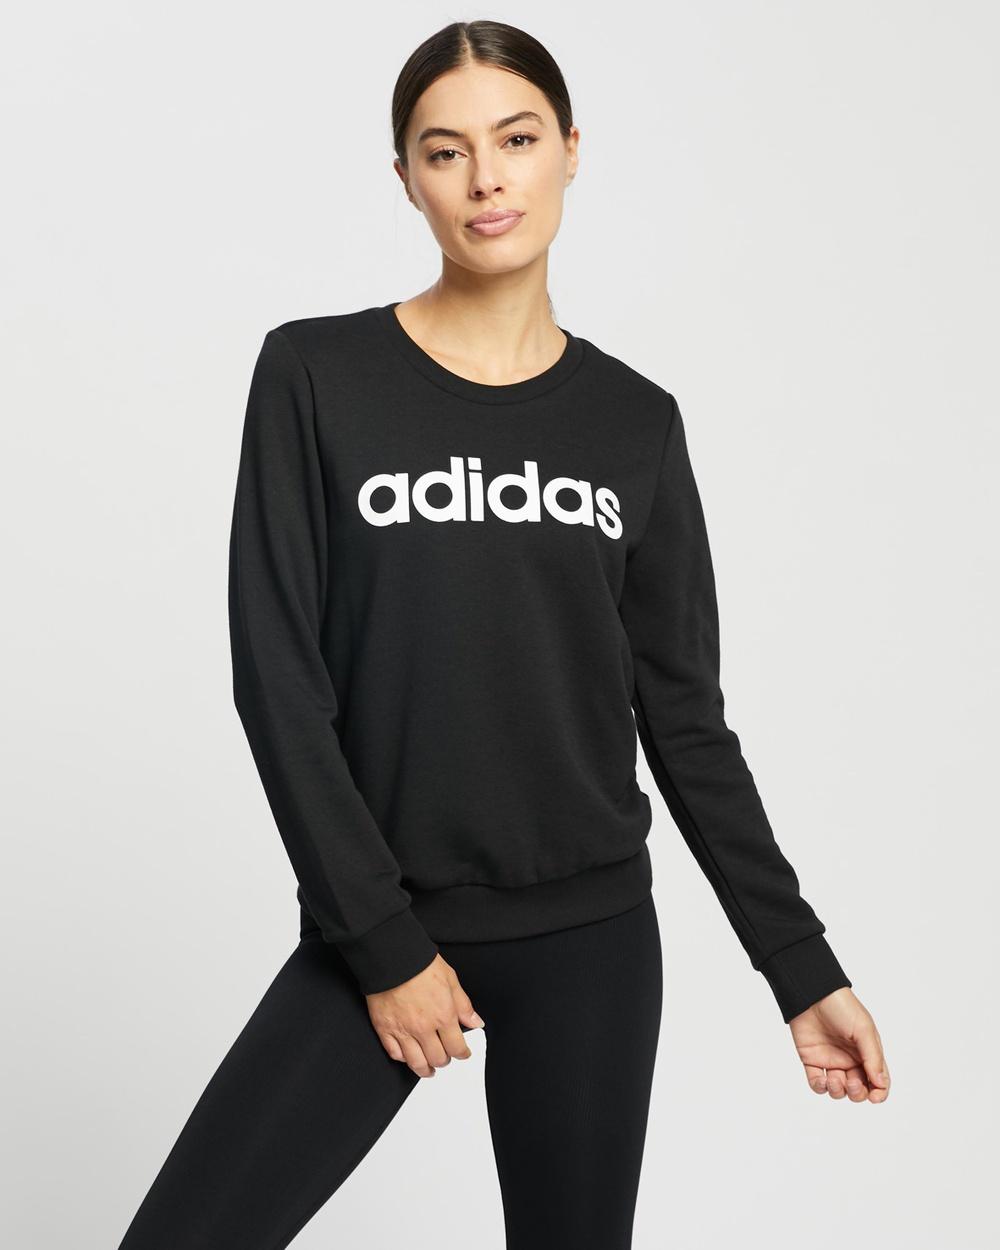 adidas Performance Essentials Logo Sweatshirt Crew Necks Black & White